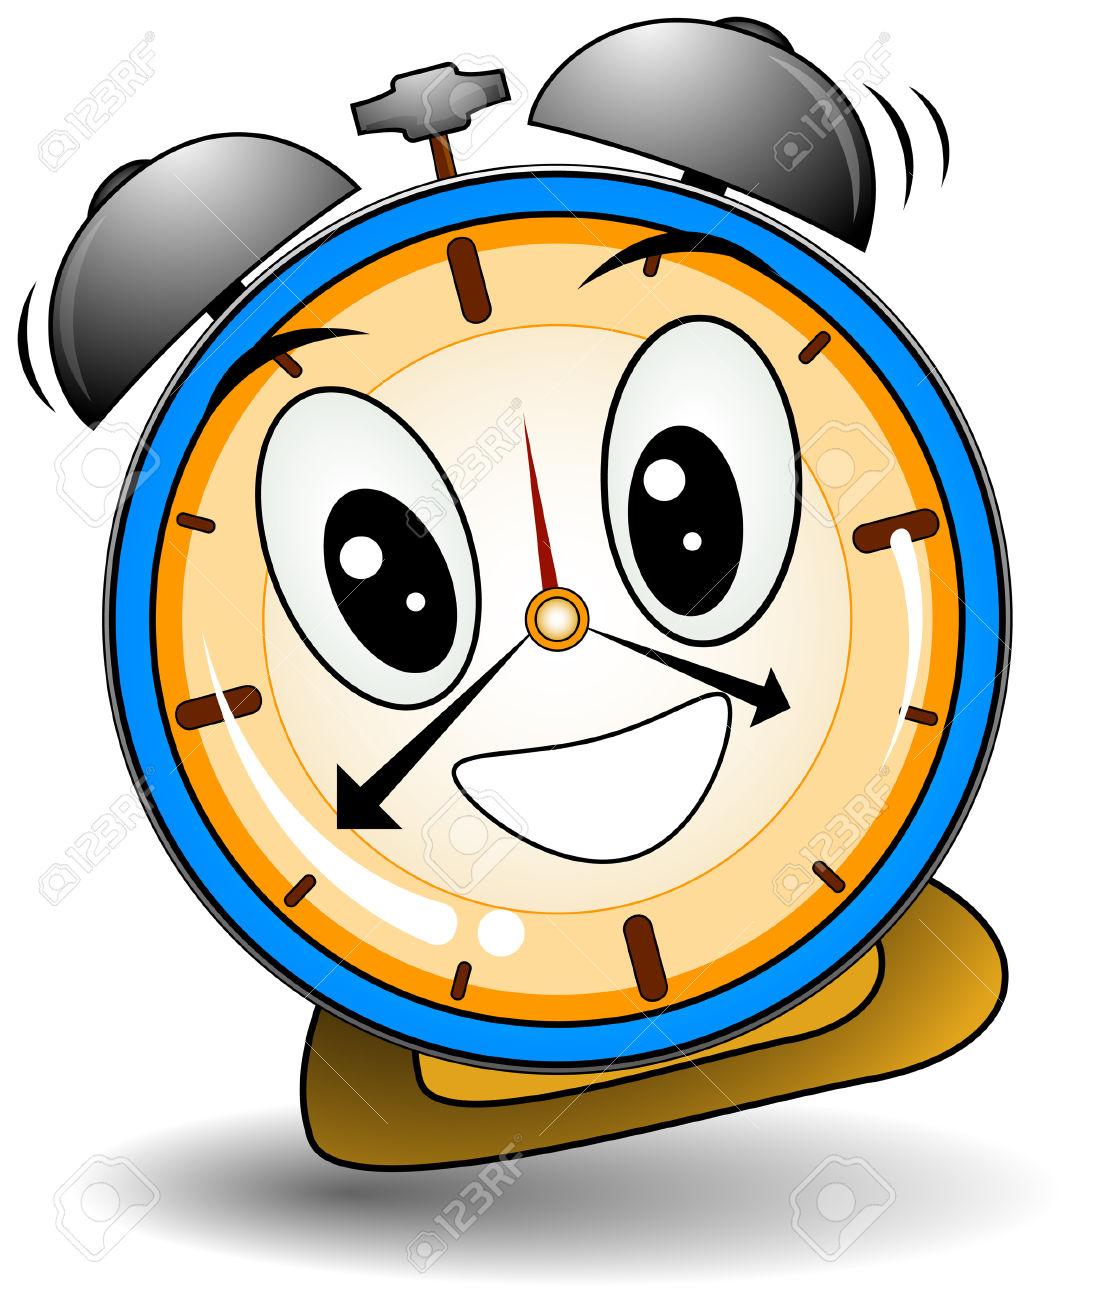 Cartoon Alarm Clock Clipart.